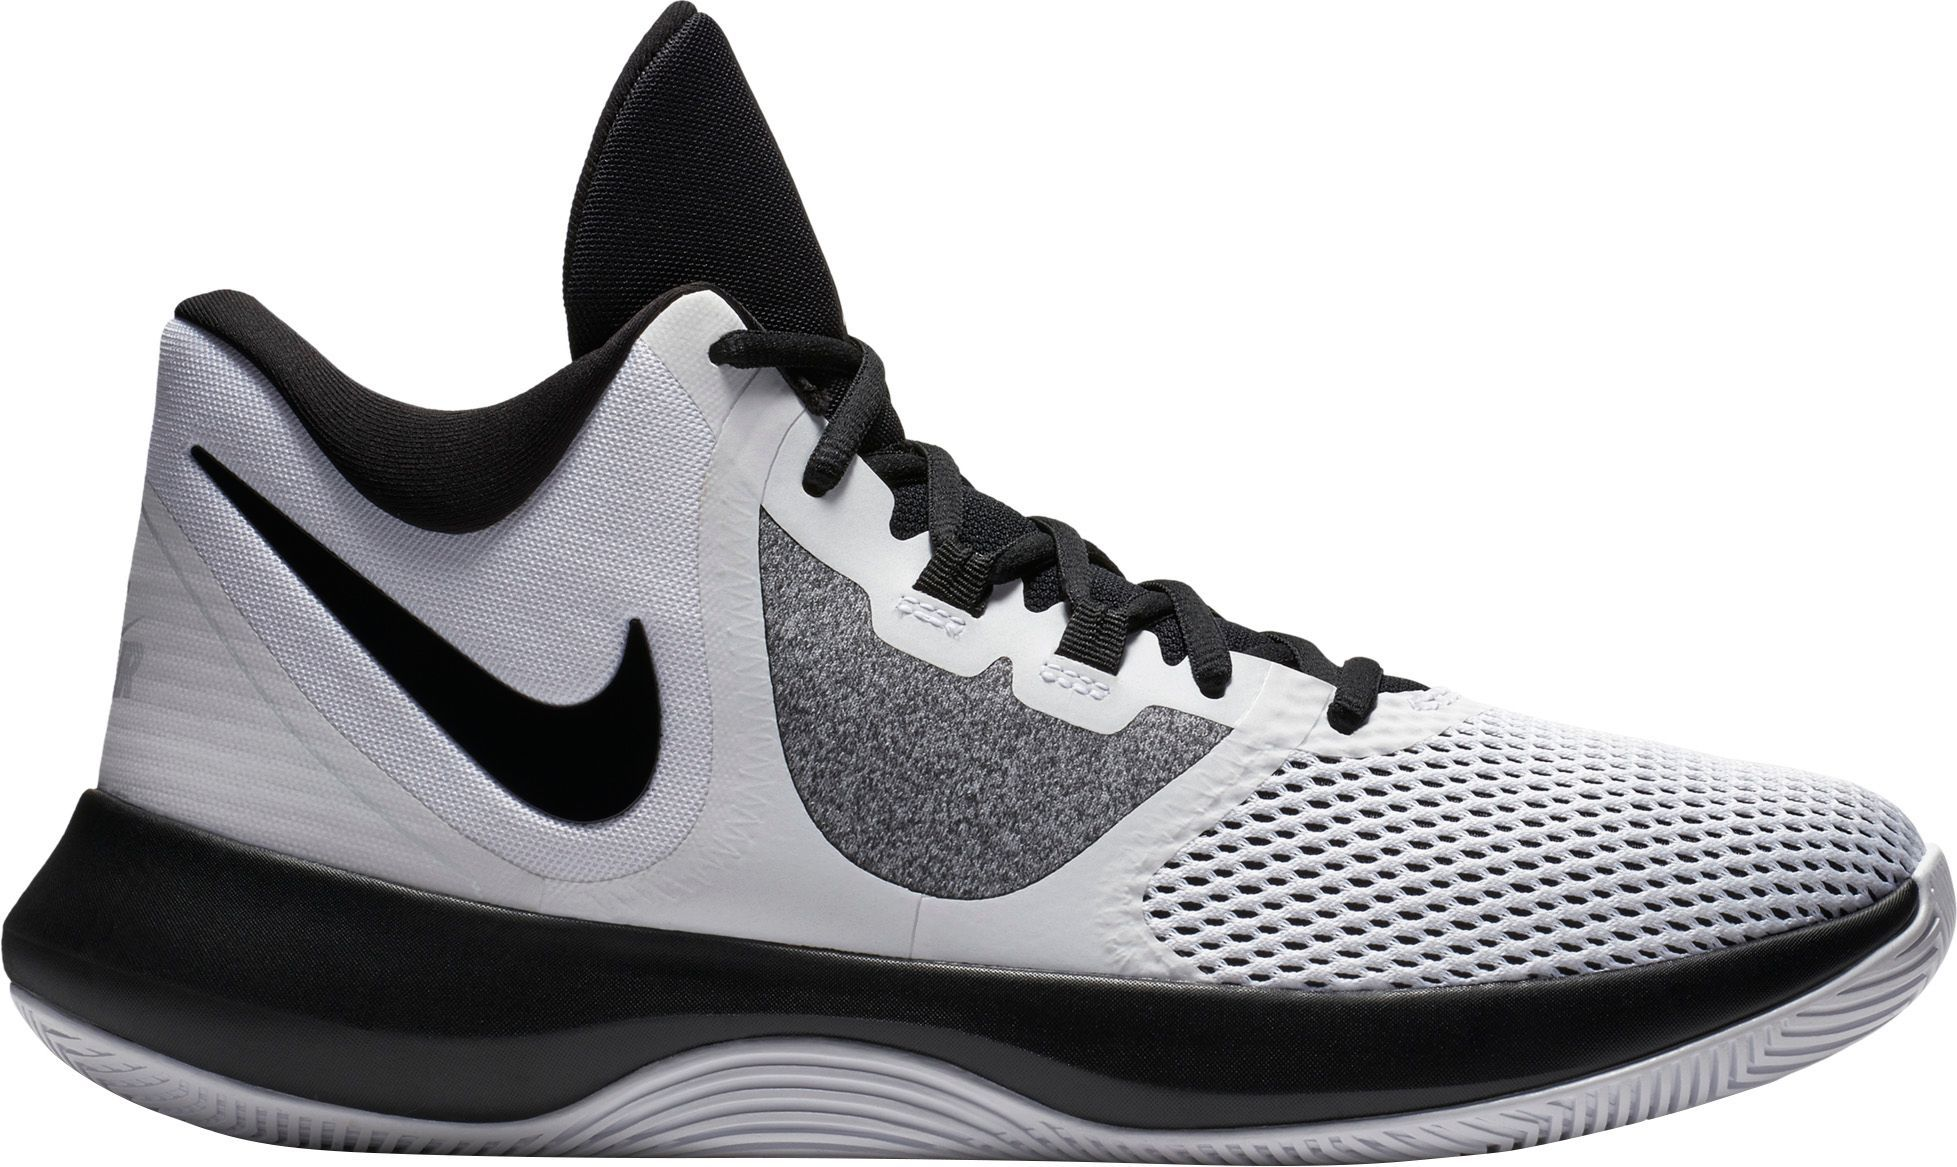 new concept 777c9 857ff Nike Air Precision II Basketball Shoes, White Black White